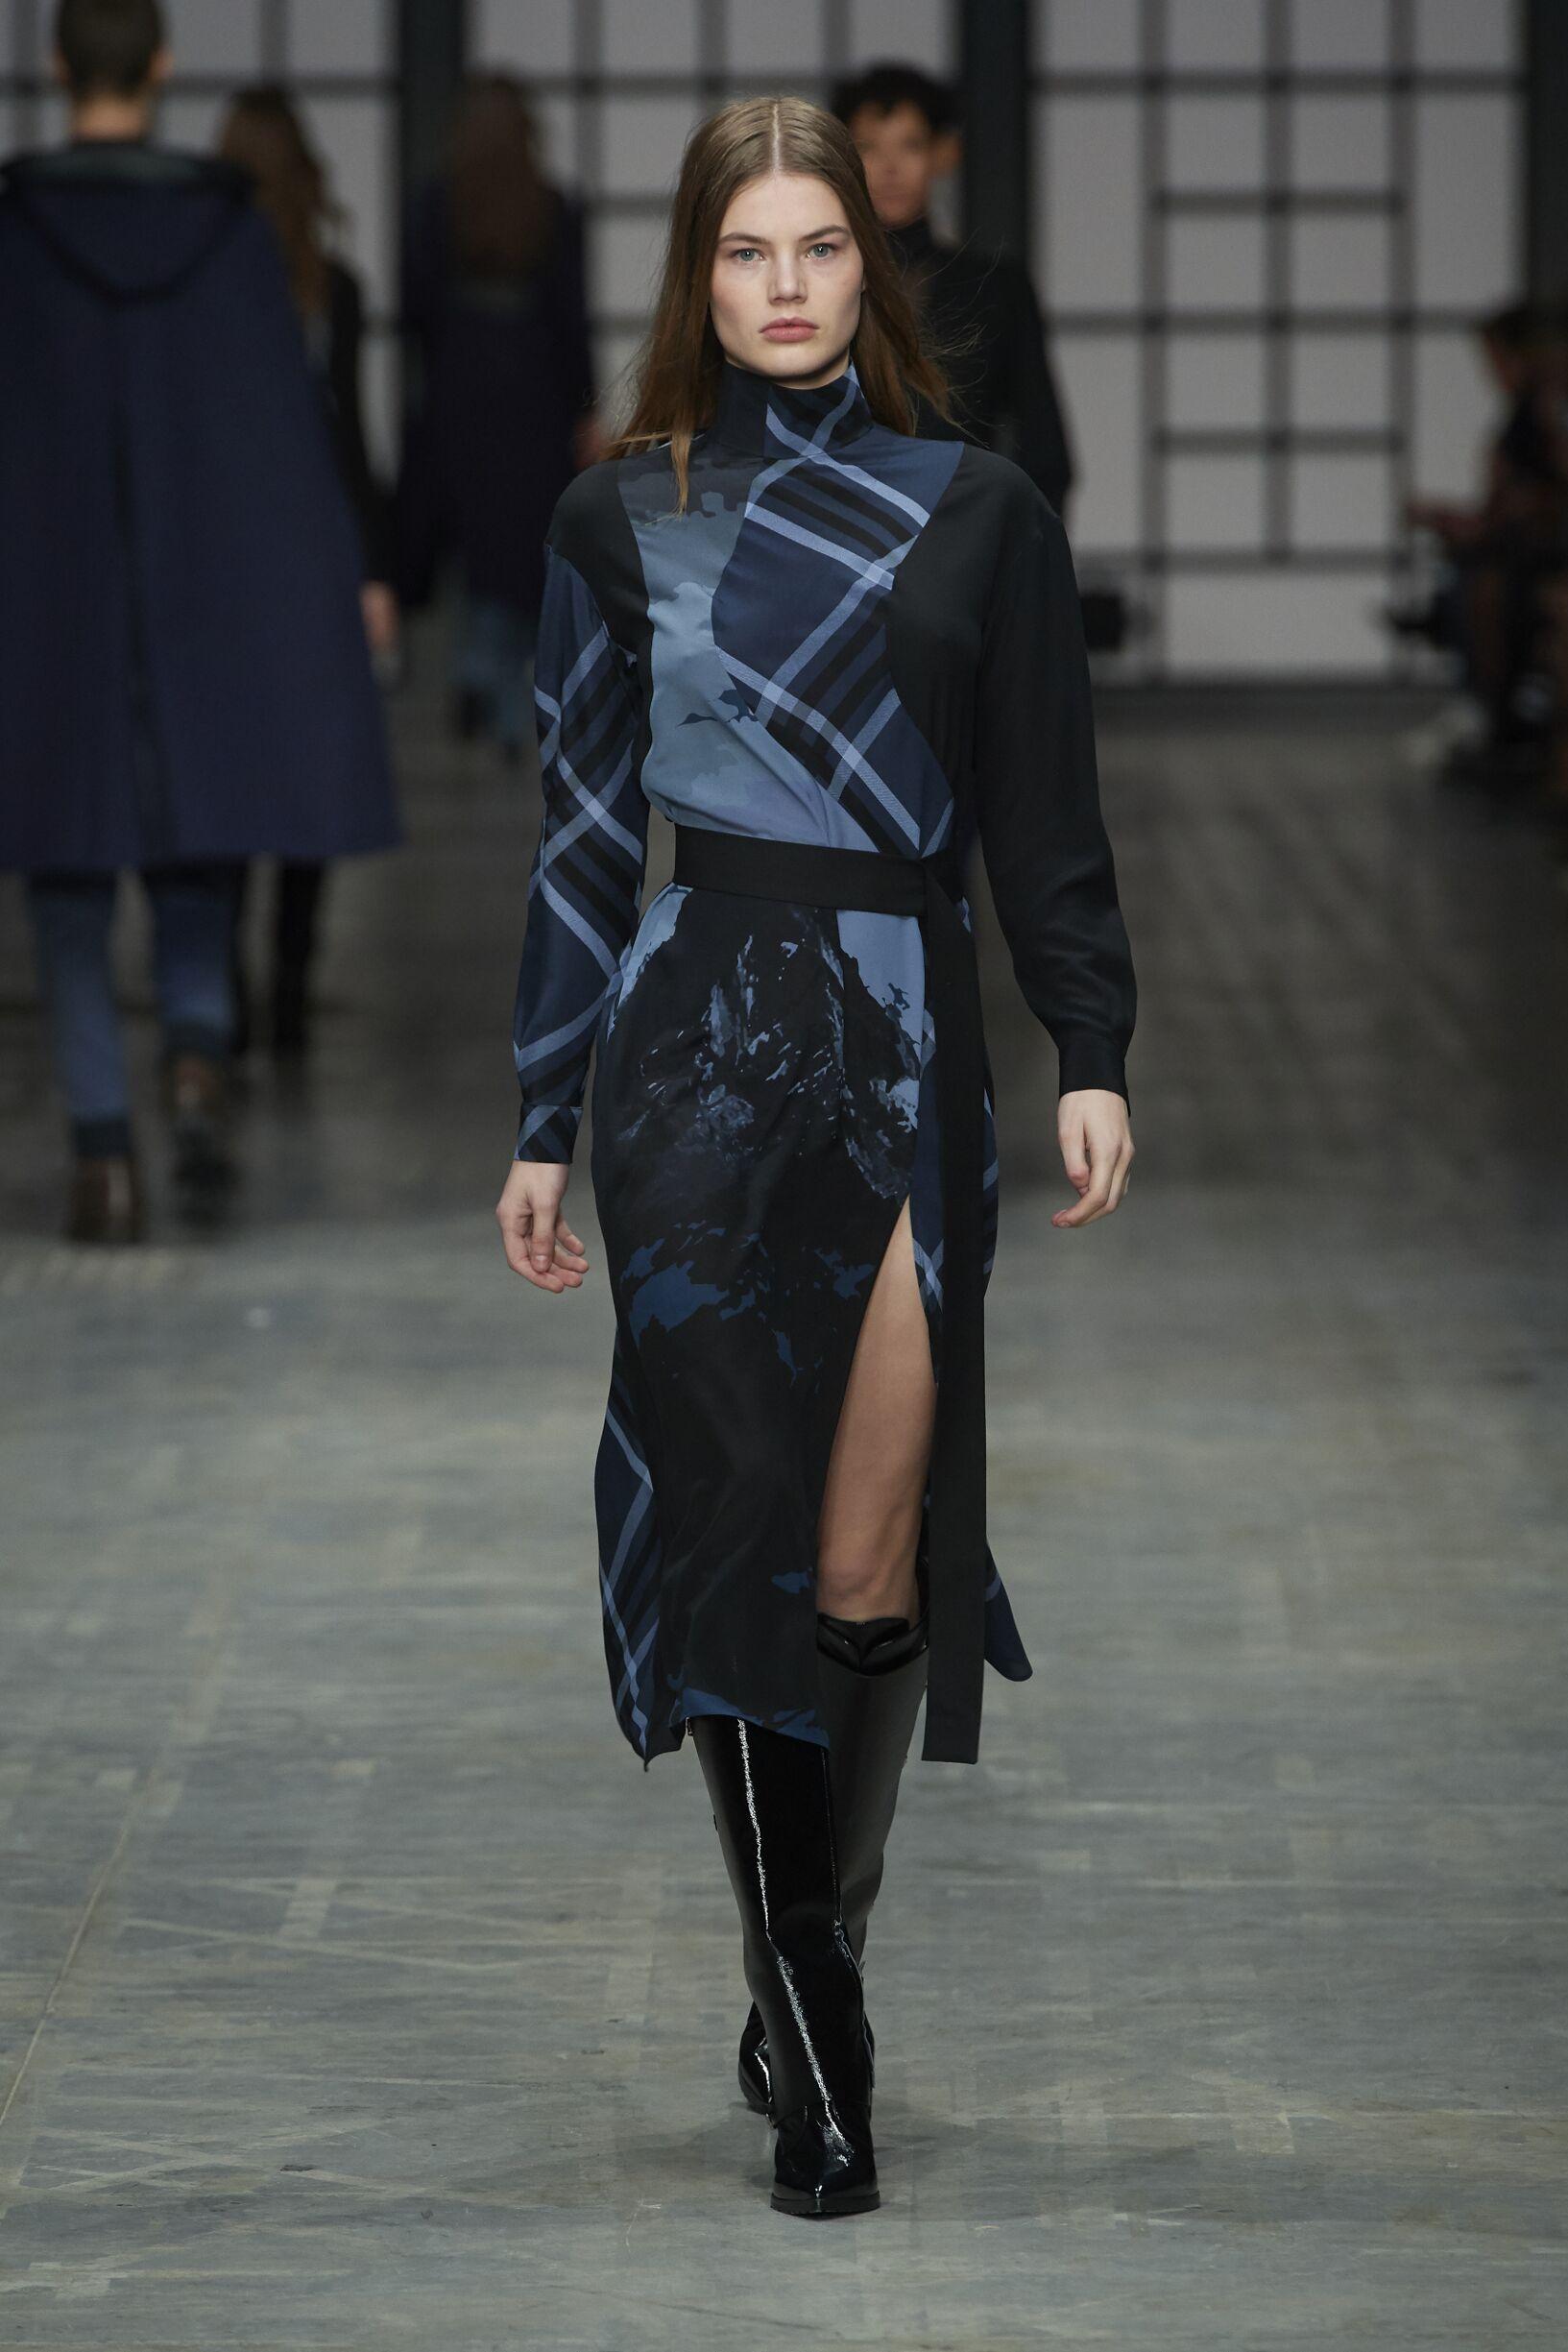 Trussardi Women's Collection 2018-19